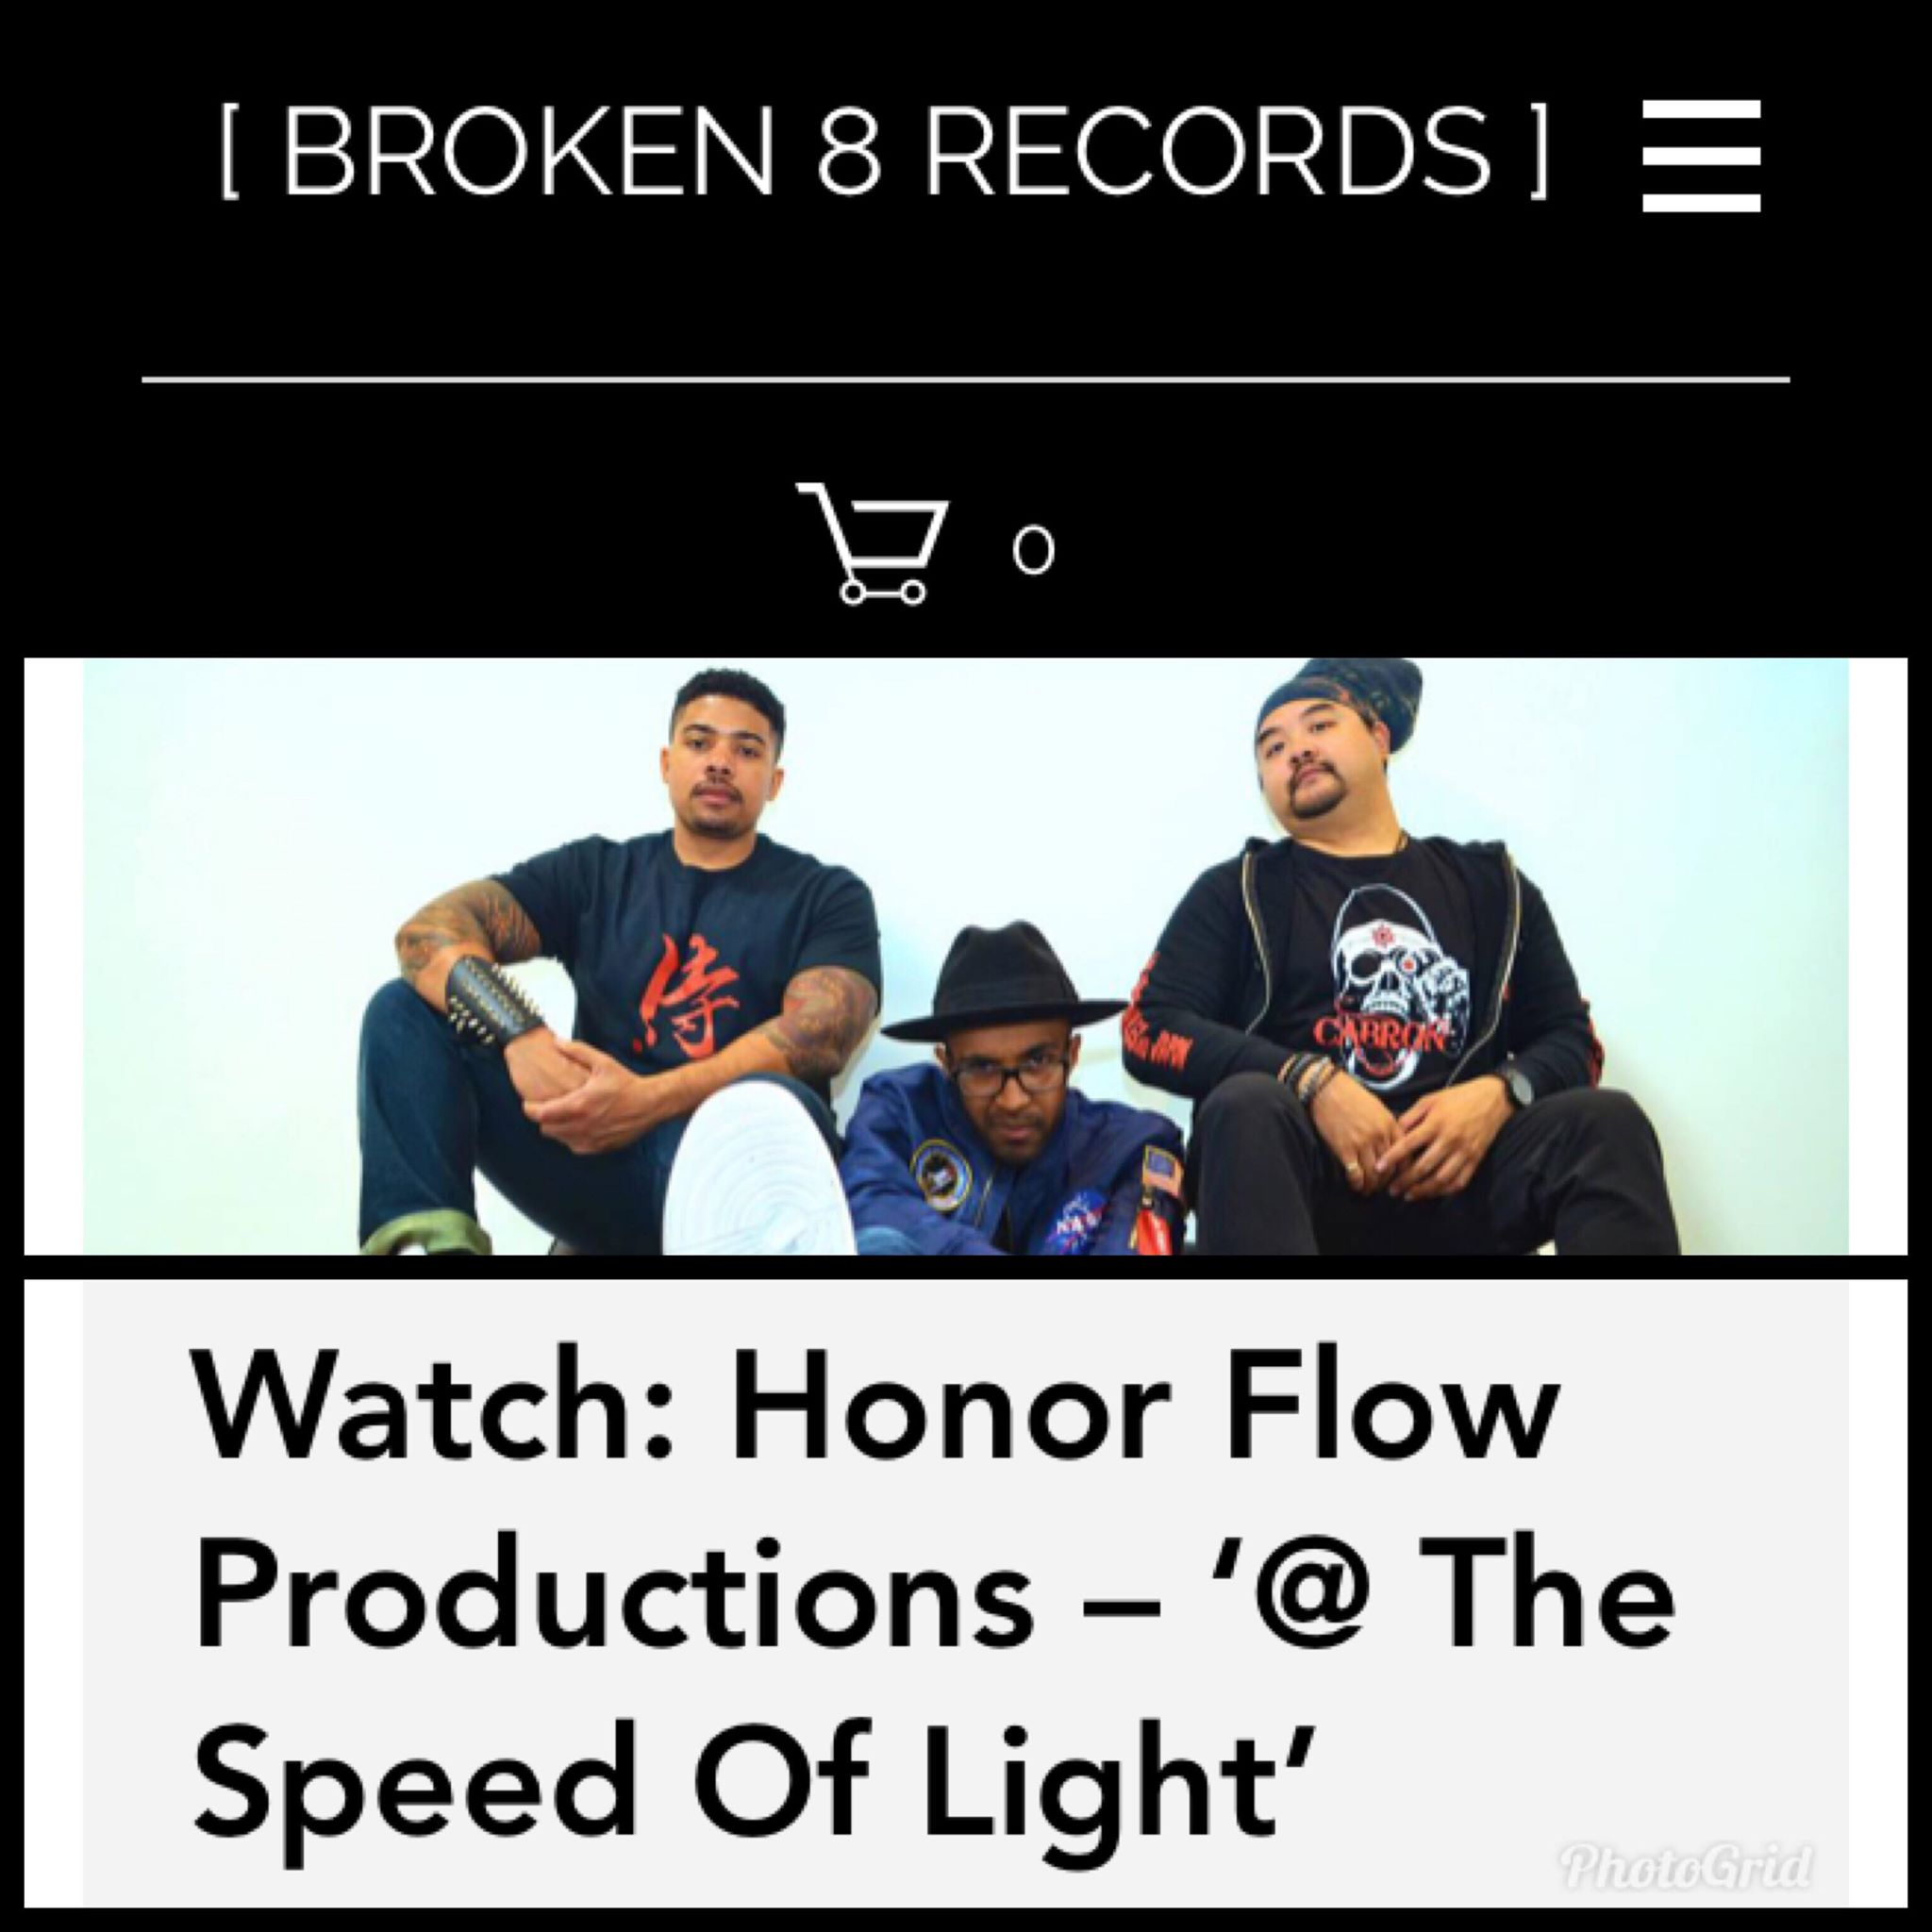 Broken 8 Records Feature